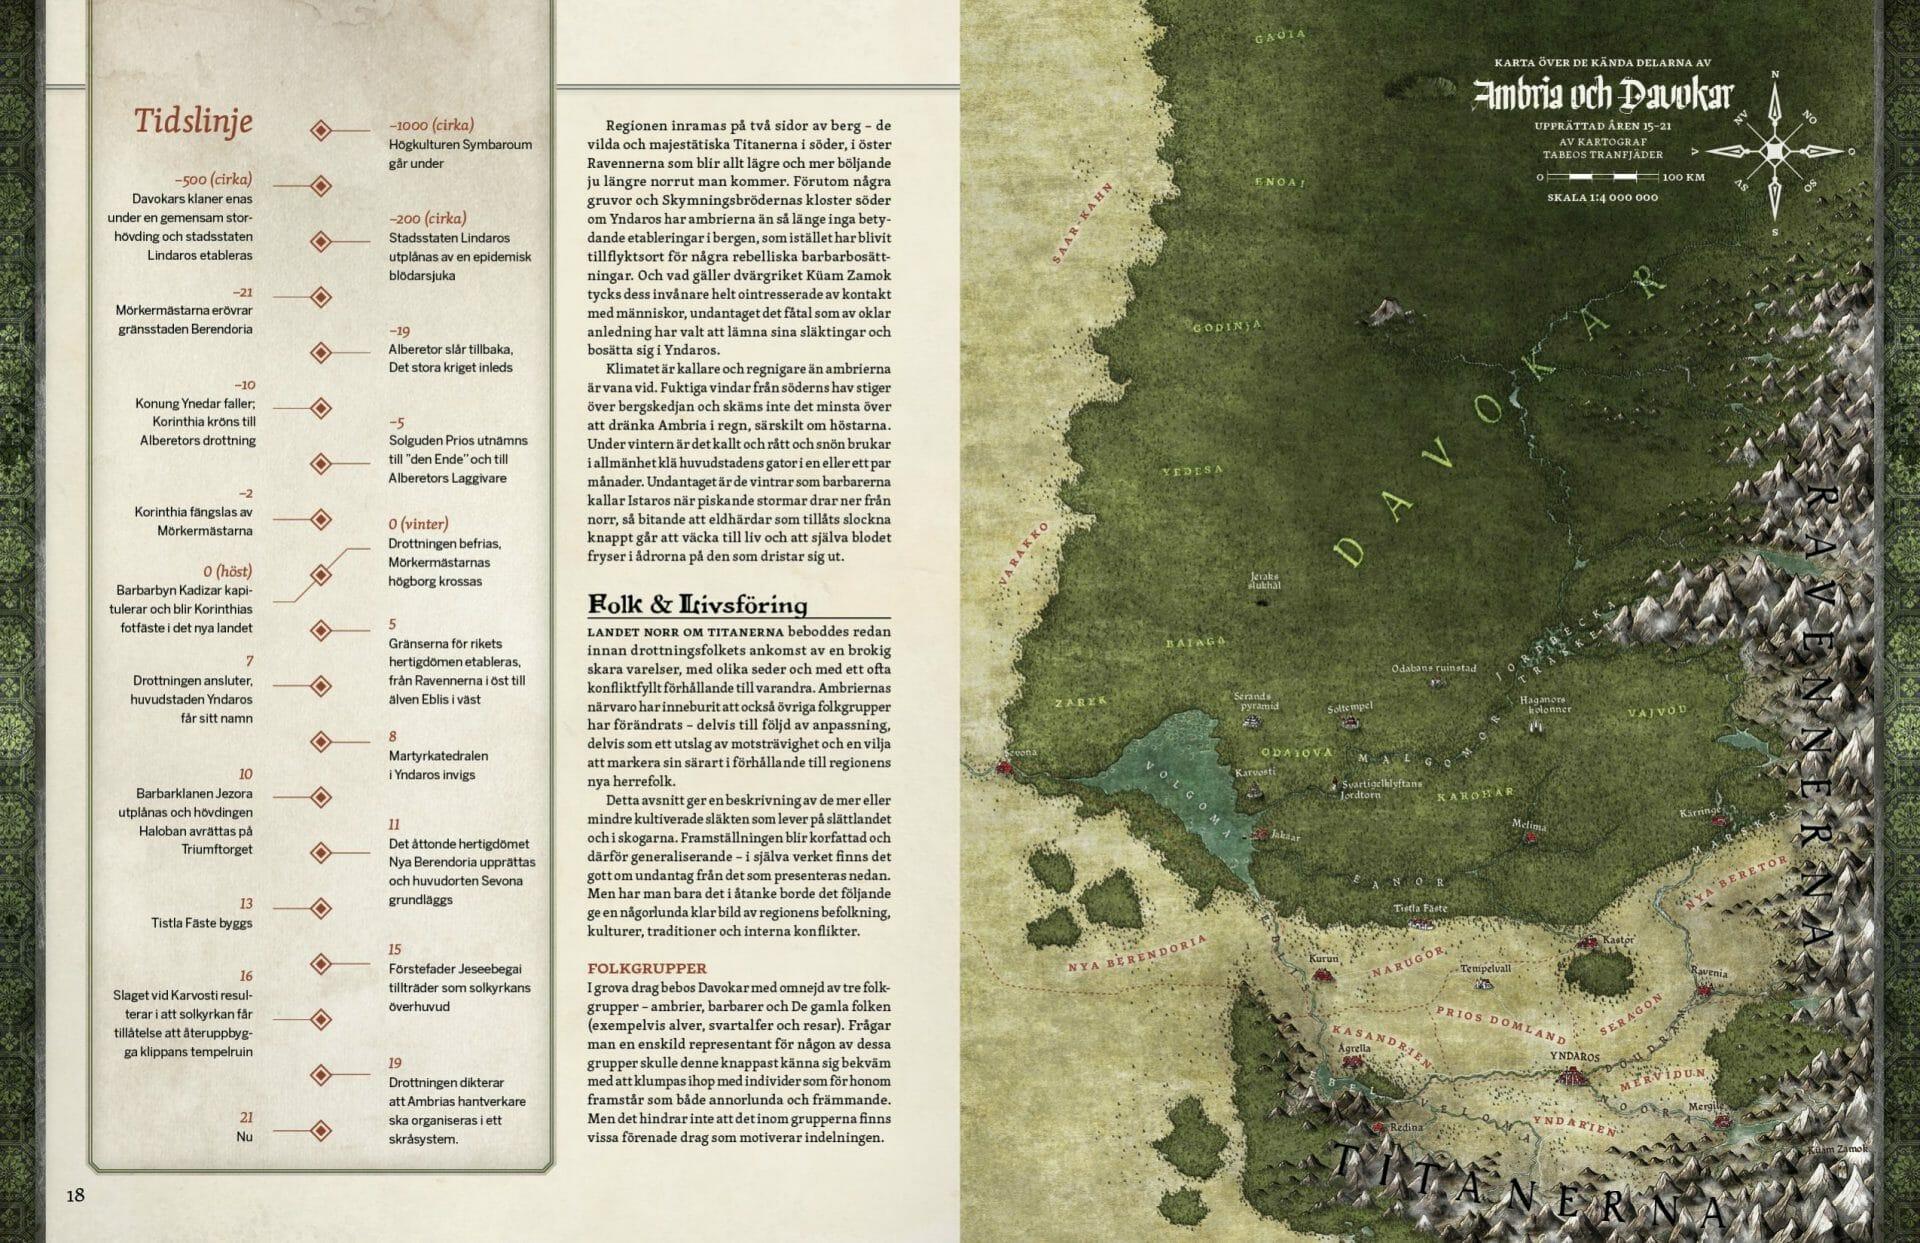 05 - World map